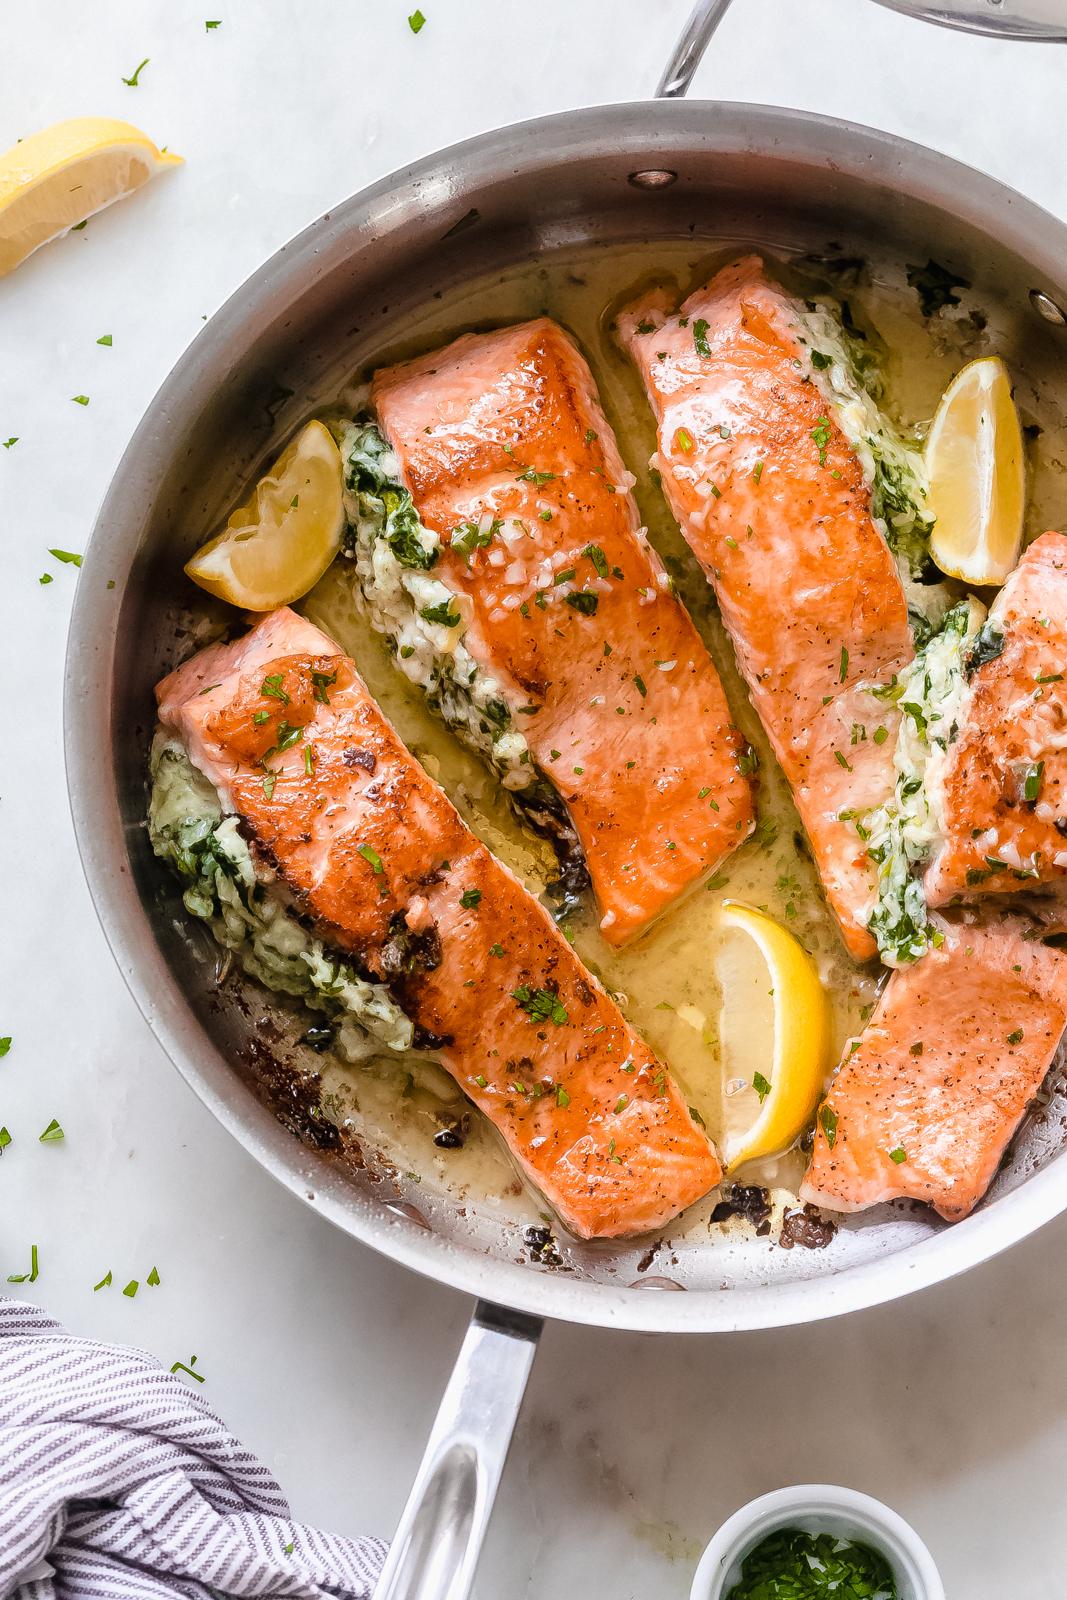 prepared seared salmon filets in stainless steel sauce pan